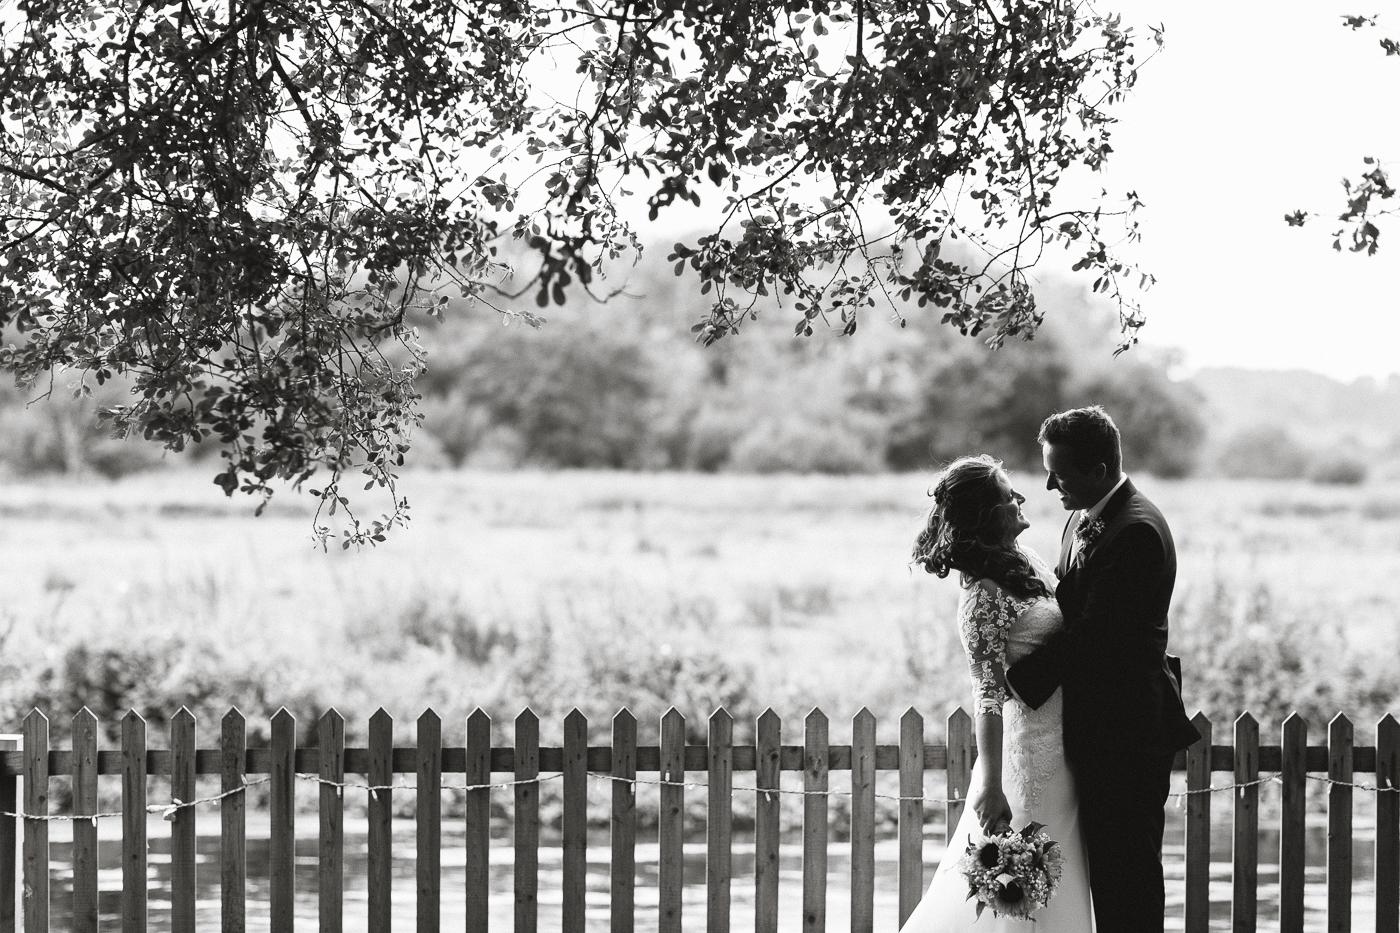 dorset wedding photographer testimonial